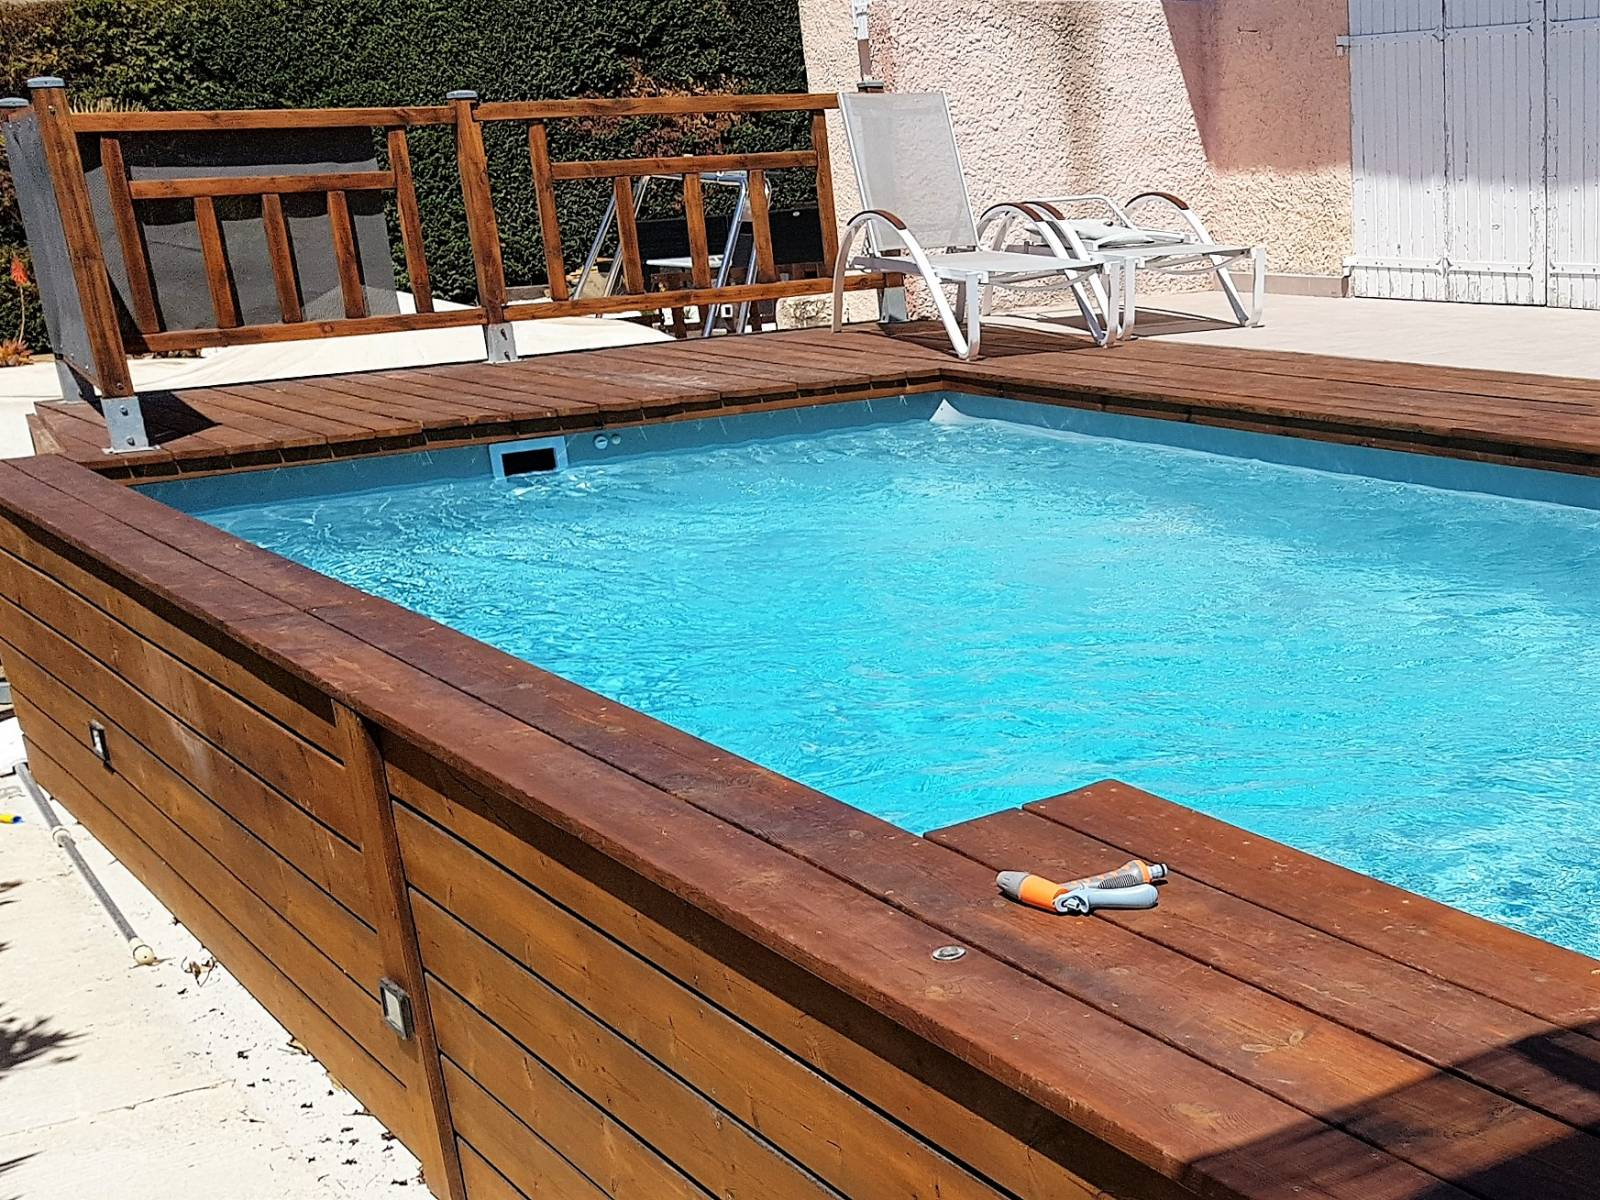 mini piscine 9x9 avec escalier sur Sanary sur mer - JCE Piscines